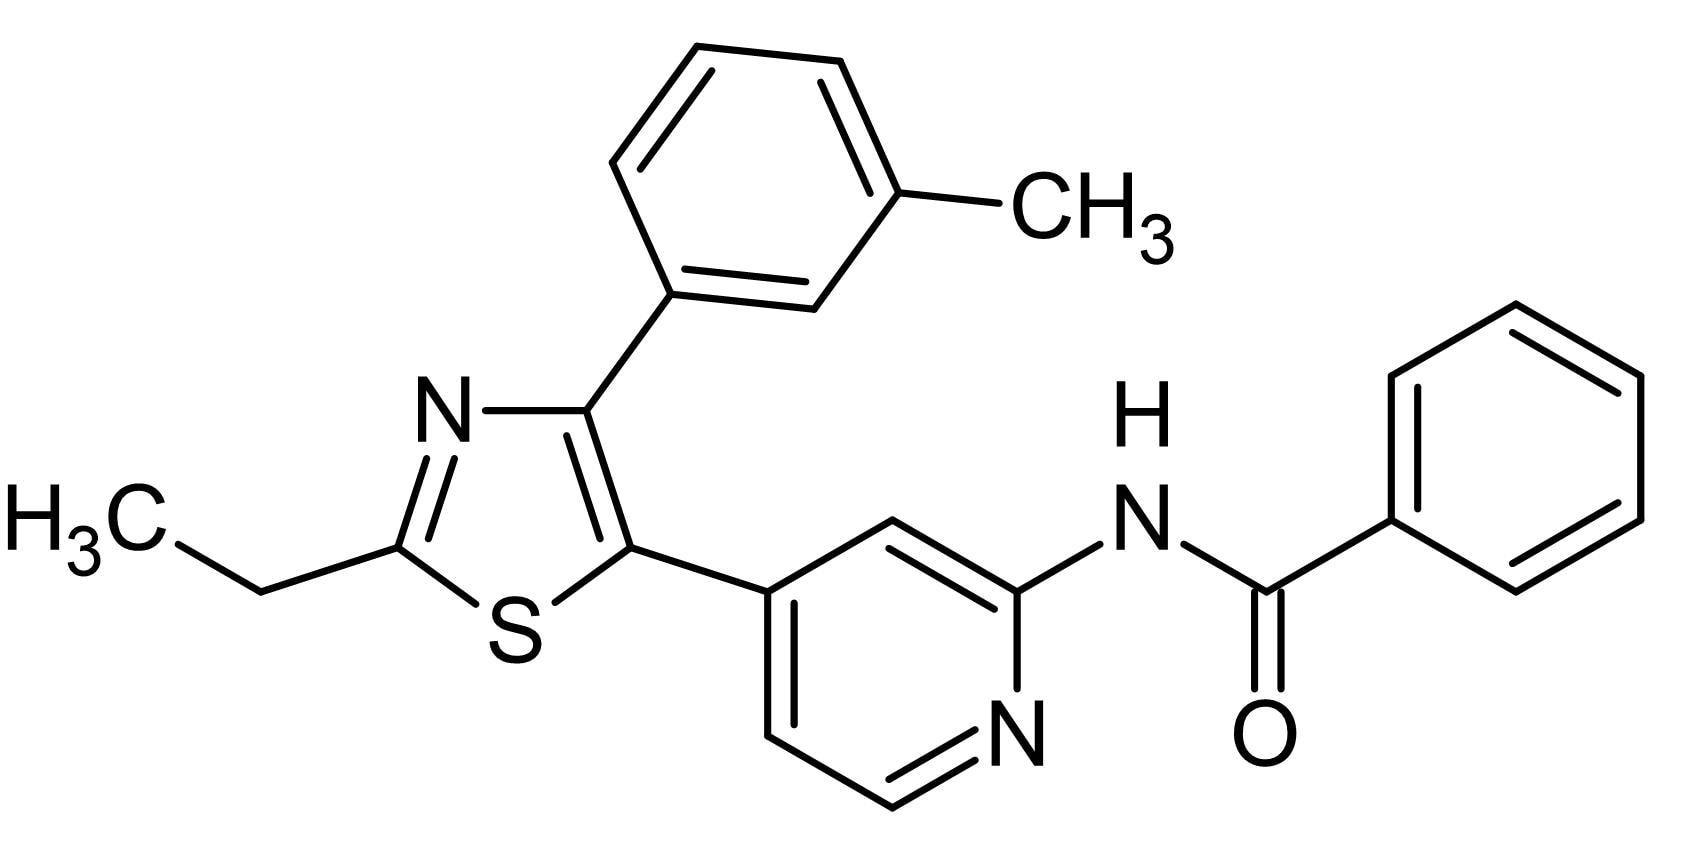 Chemical Structure - TAK 715, p38 MAPK inhibitor (ab120989)